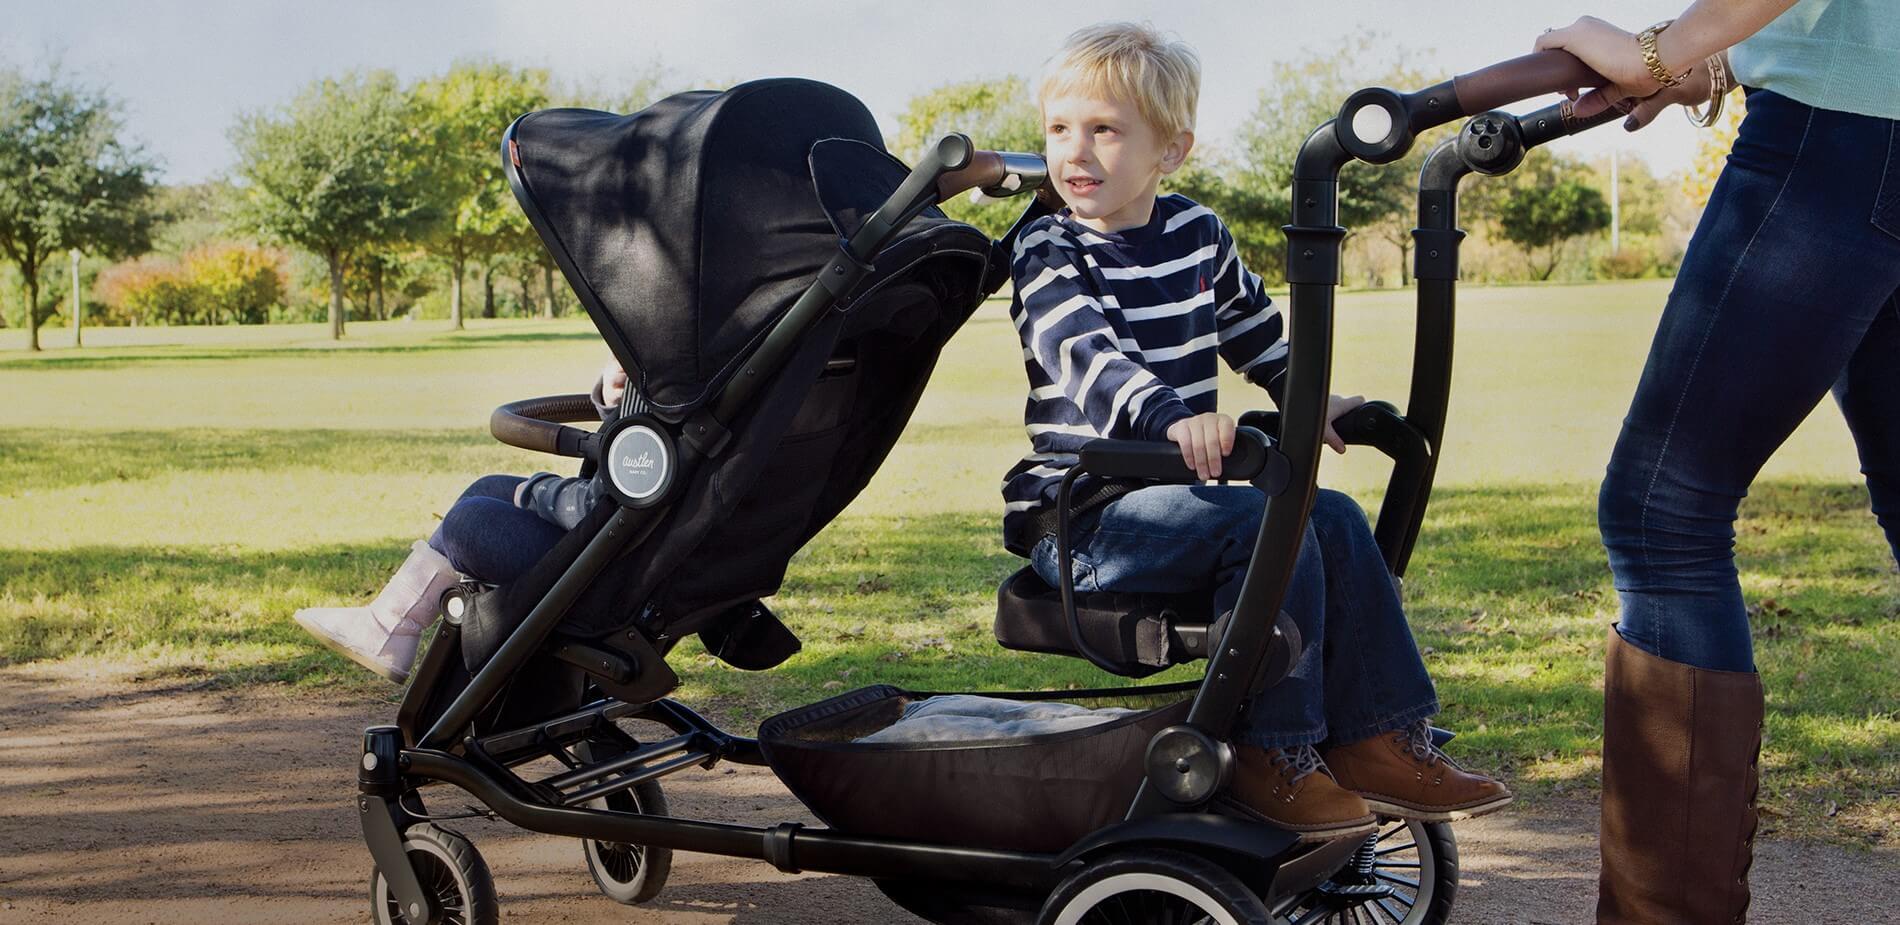 Austlen Entourage Stroller Review